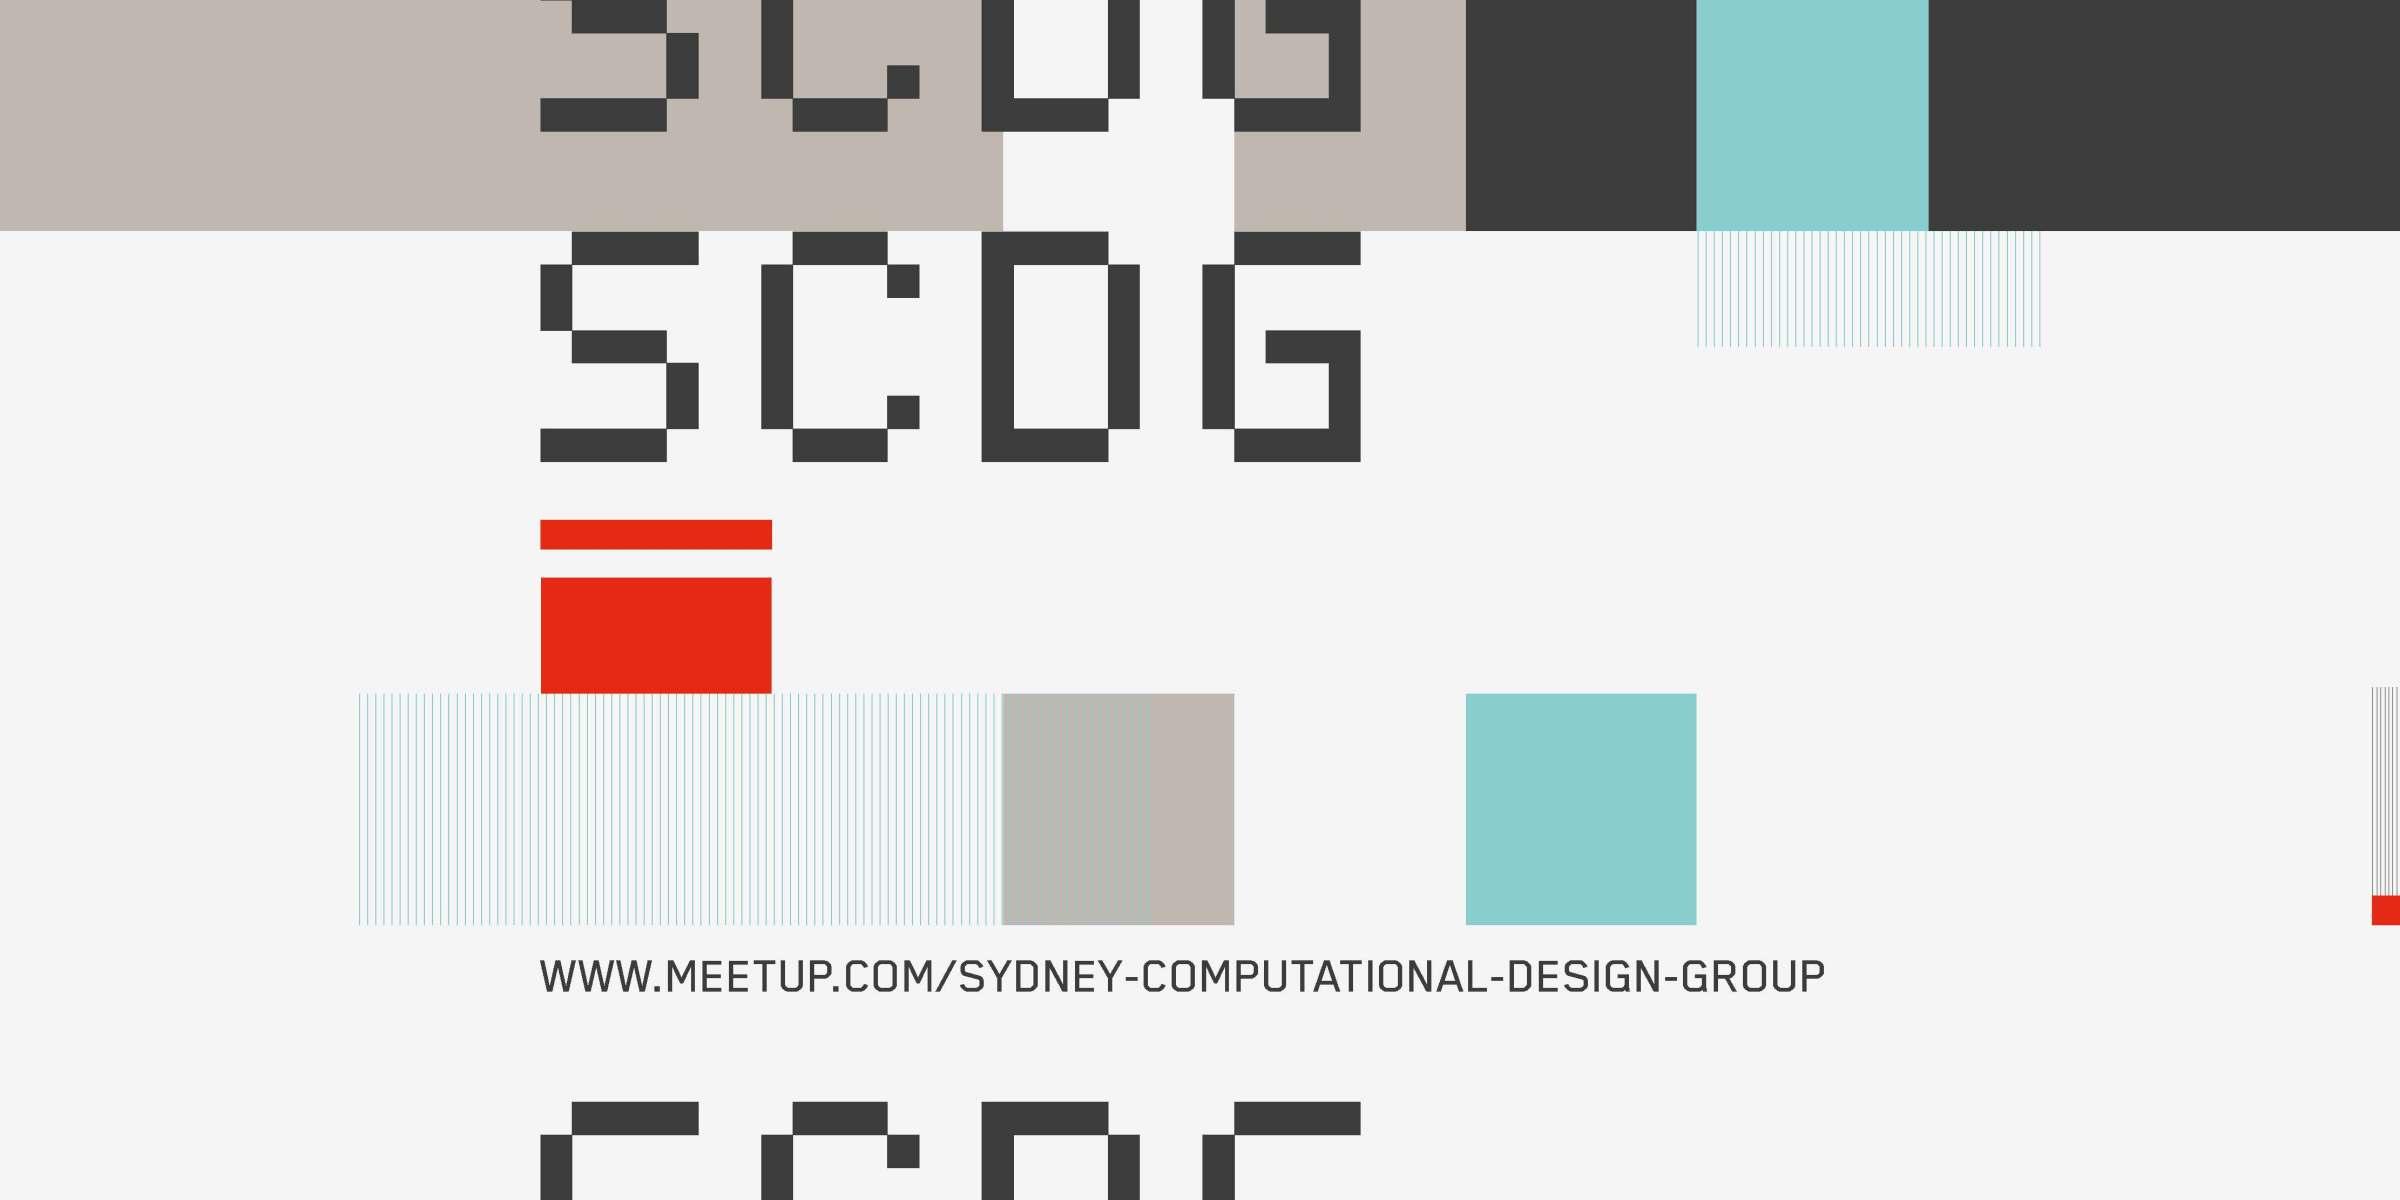 SCDG_A6_flyer_1600x800